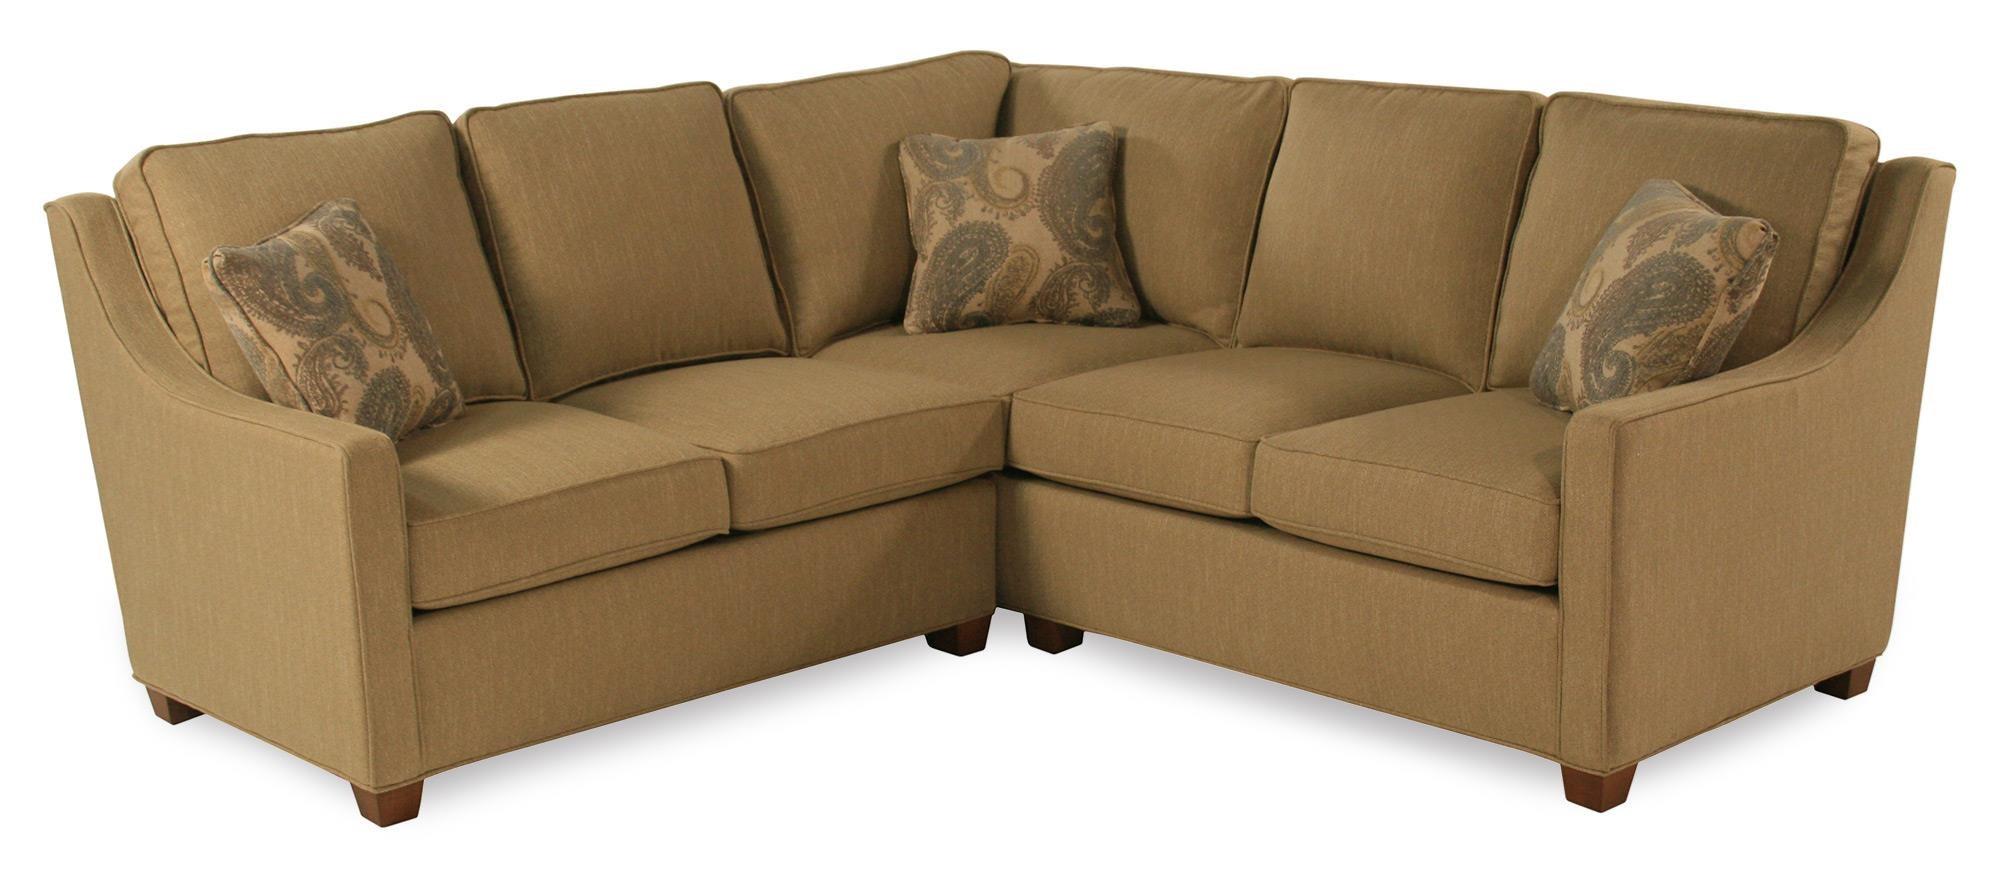 Perfect Hallagan Furniture Highland Park 2 Piece Sectional   Item Number: 44LBS RT